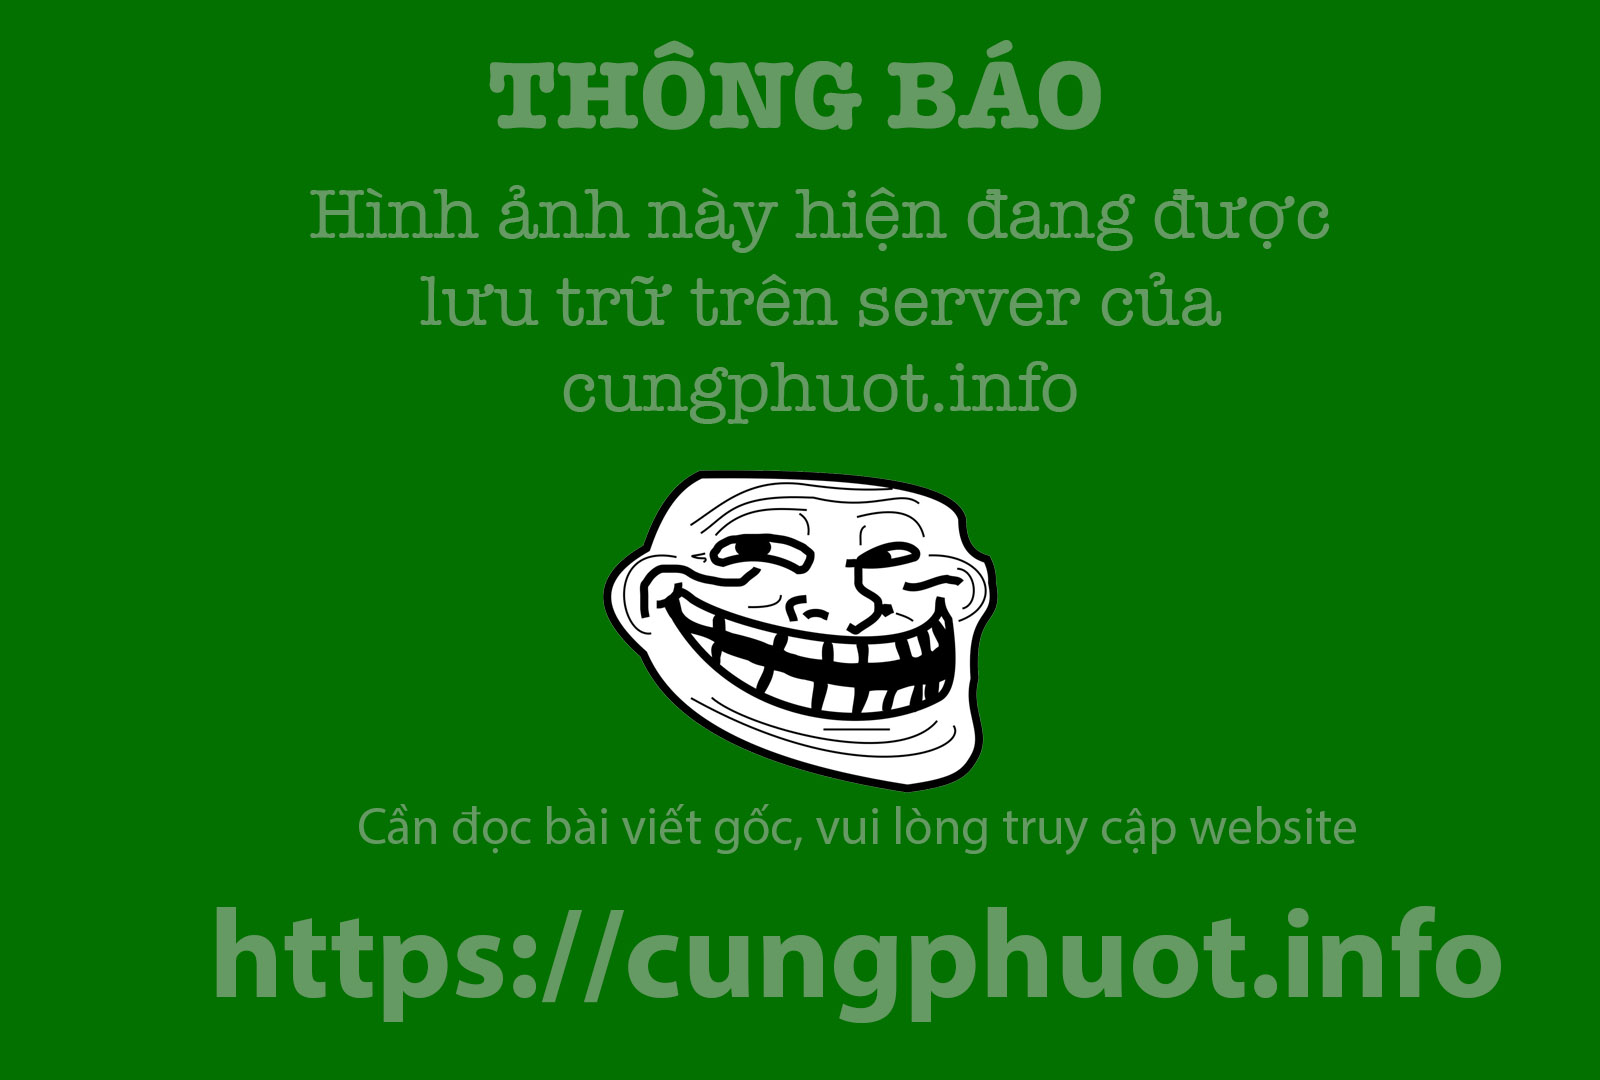 Dan phuot me man ve dep ky vi cua hang Prai o Quang Tri hinh anh 17